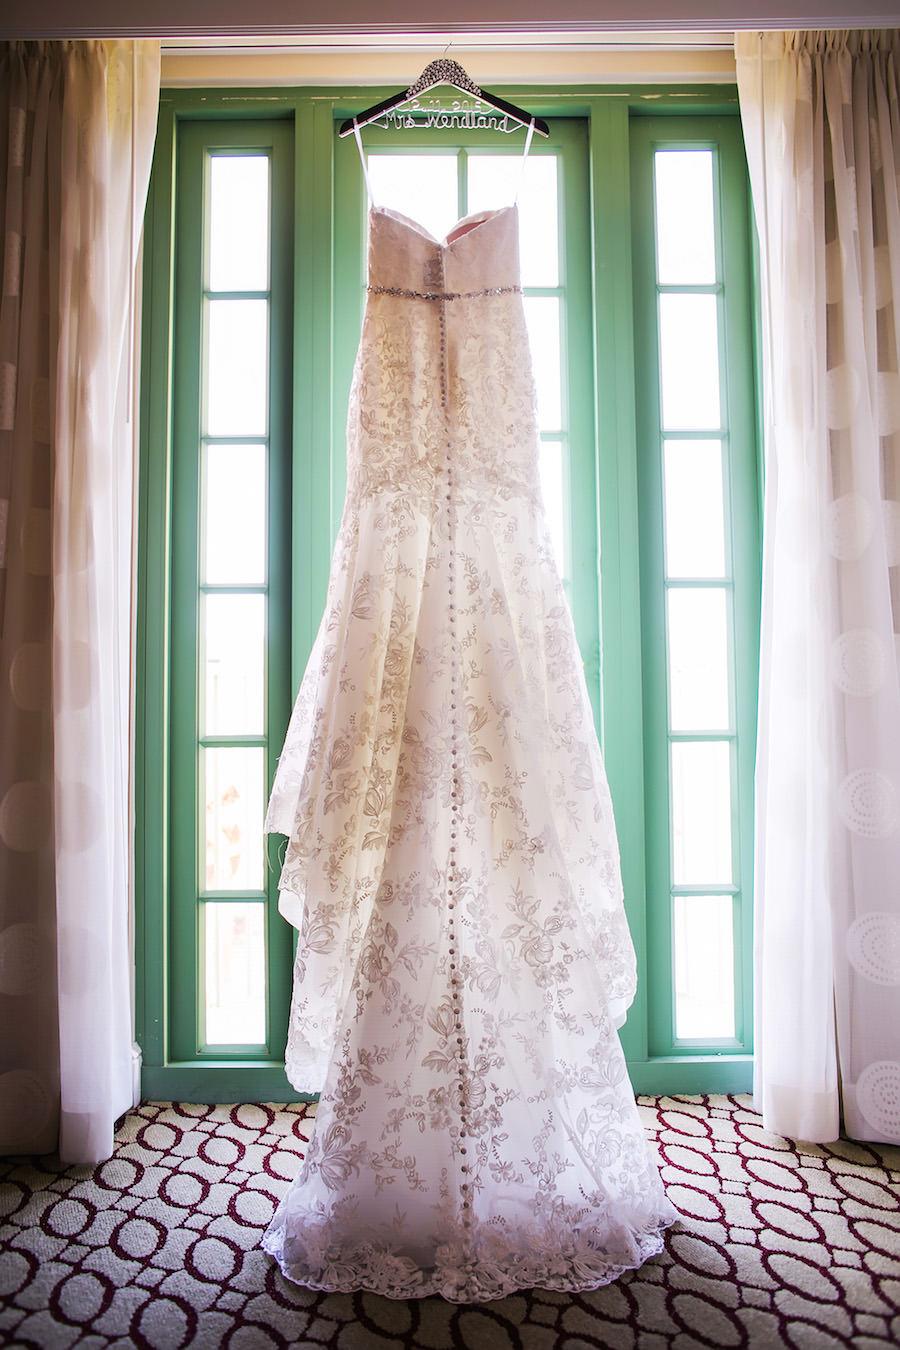 White Lace Trumpet Style Allure Wedding Dress with Rhinestone Belt | St Petersburg Wedding Photographer Limelight Photography